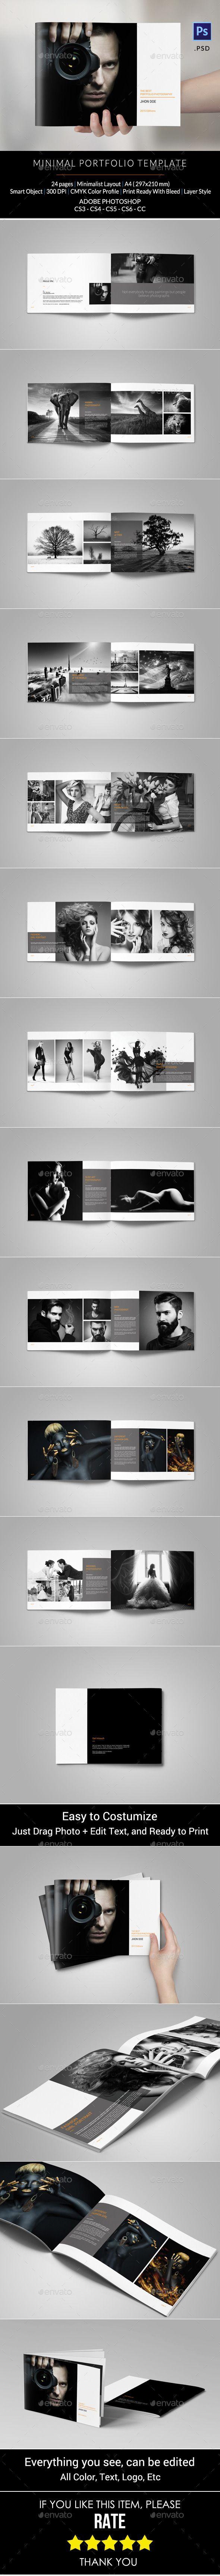 Portfolio Photographer Brochure Template #design Download: http://graphicriver.net/item/portfolio-photographer/12696125?ref=ksioks